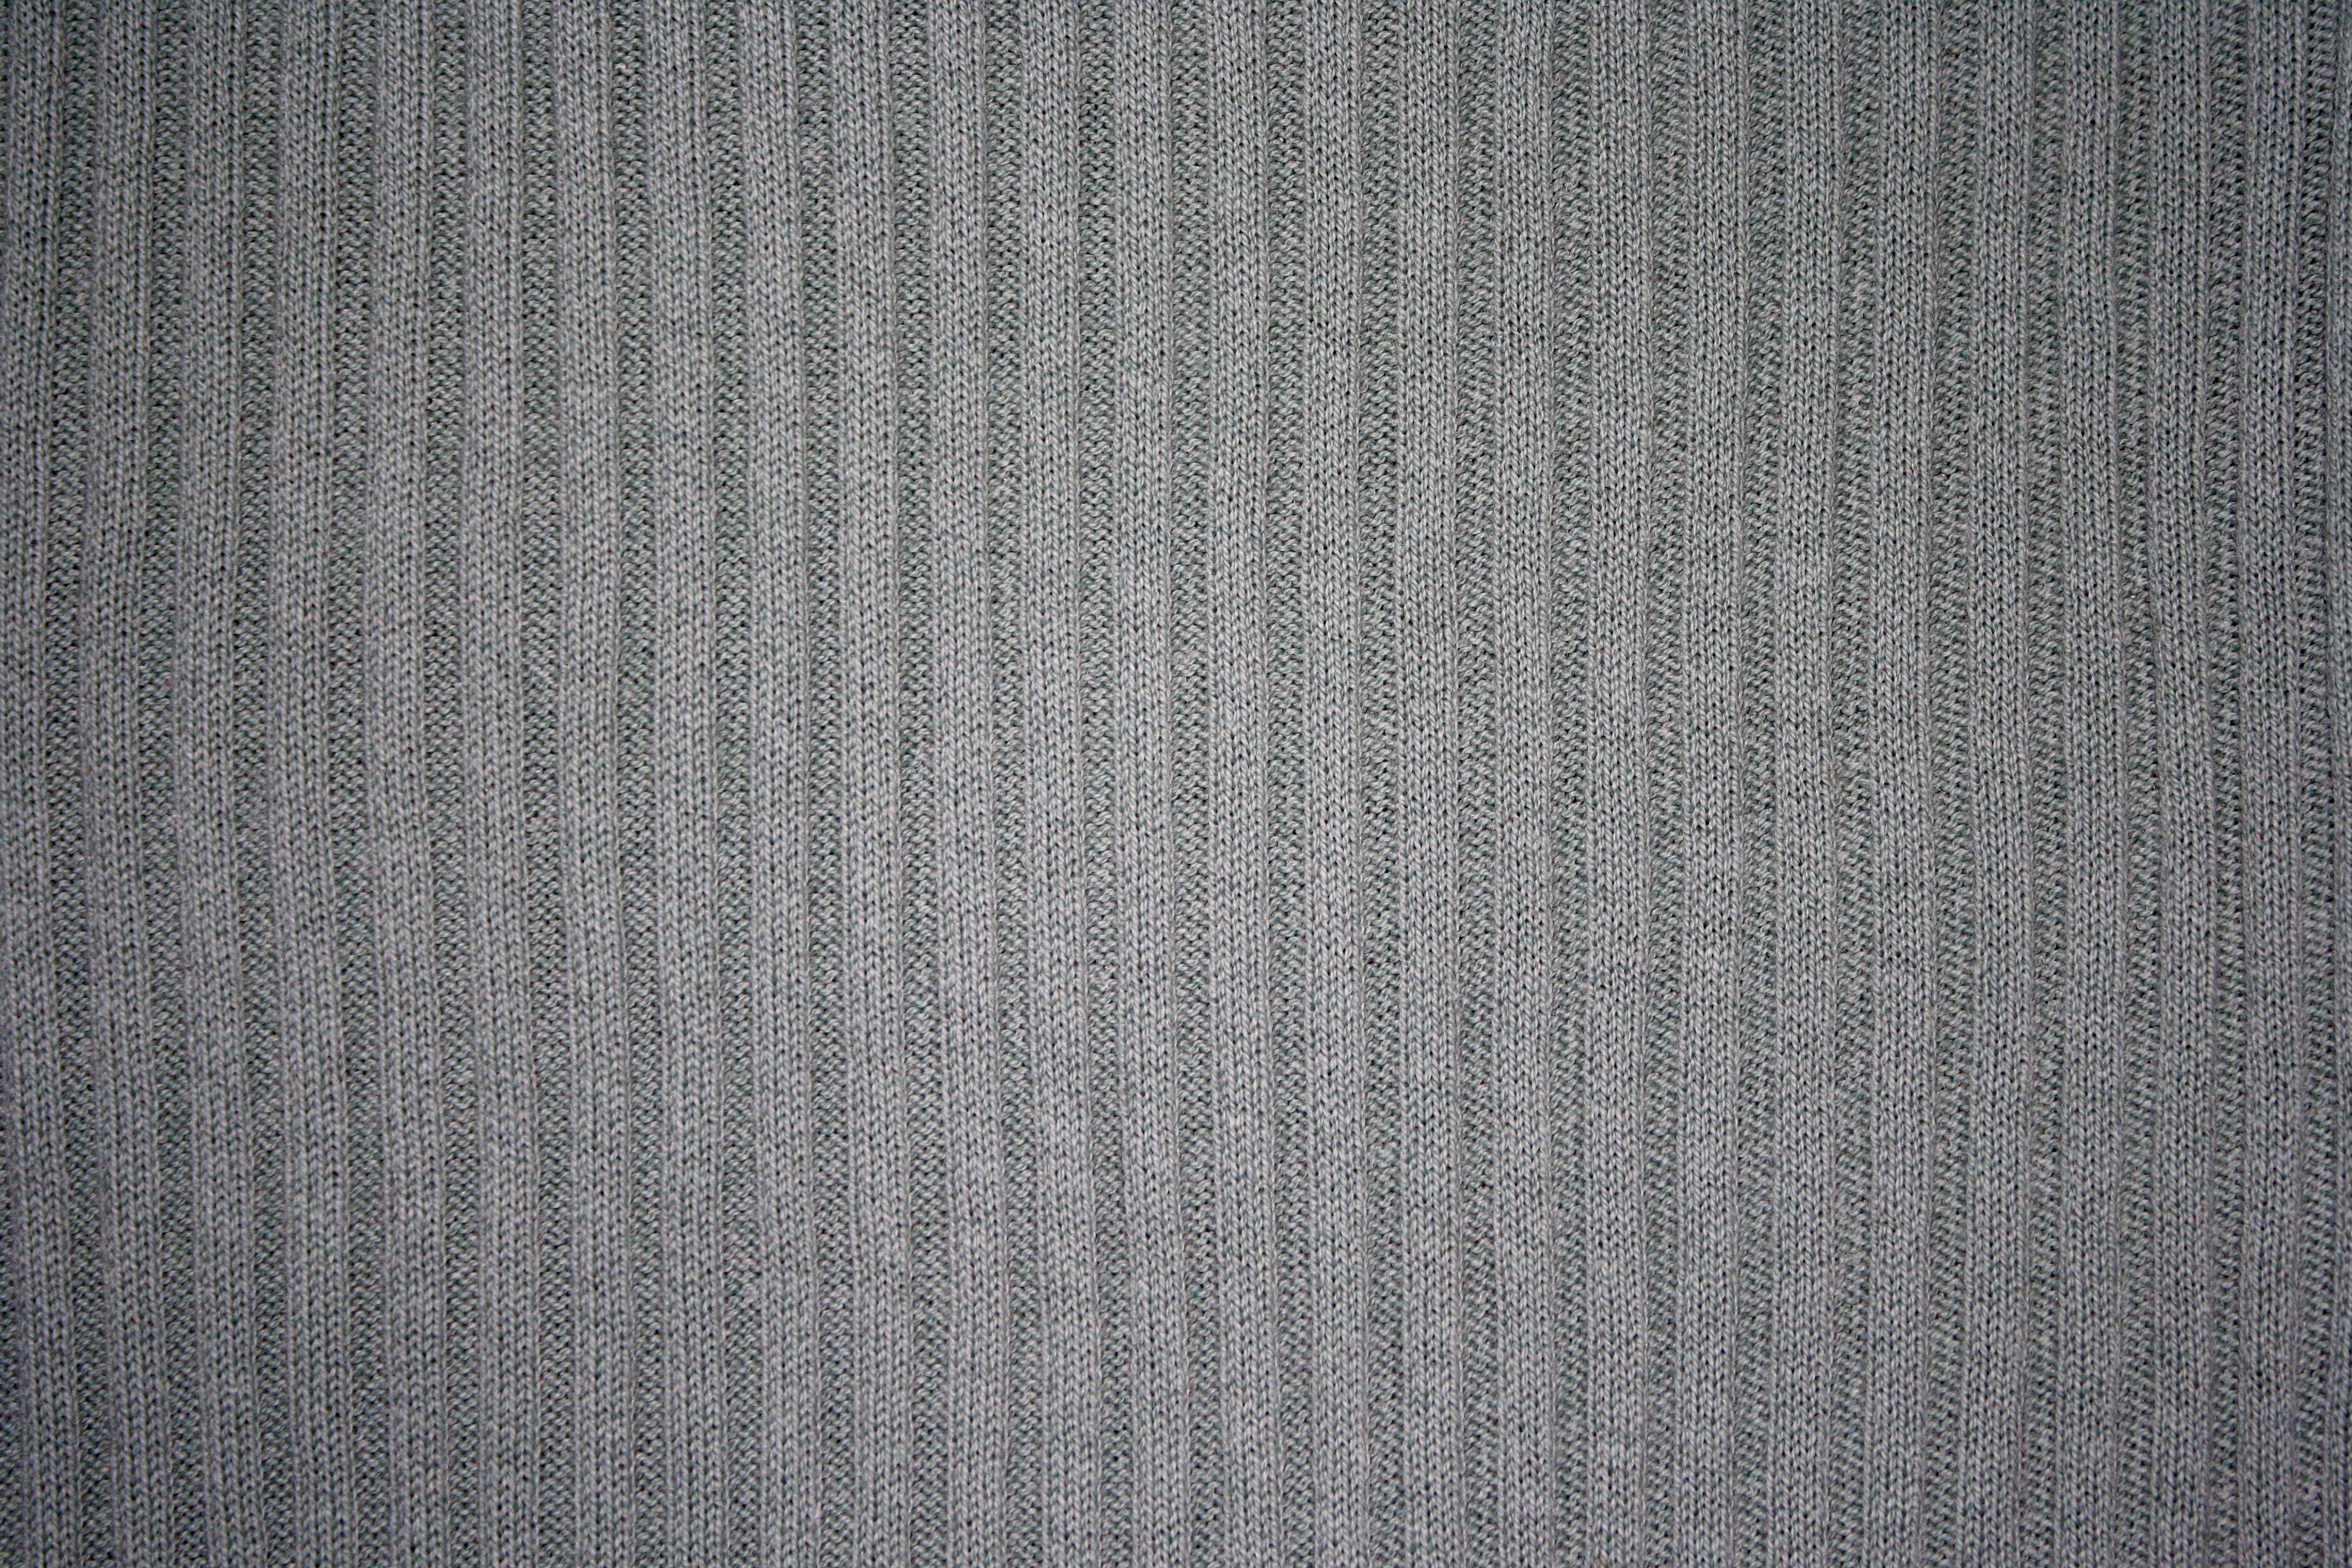 Knit Baby Leggings Pattern